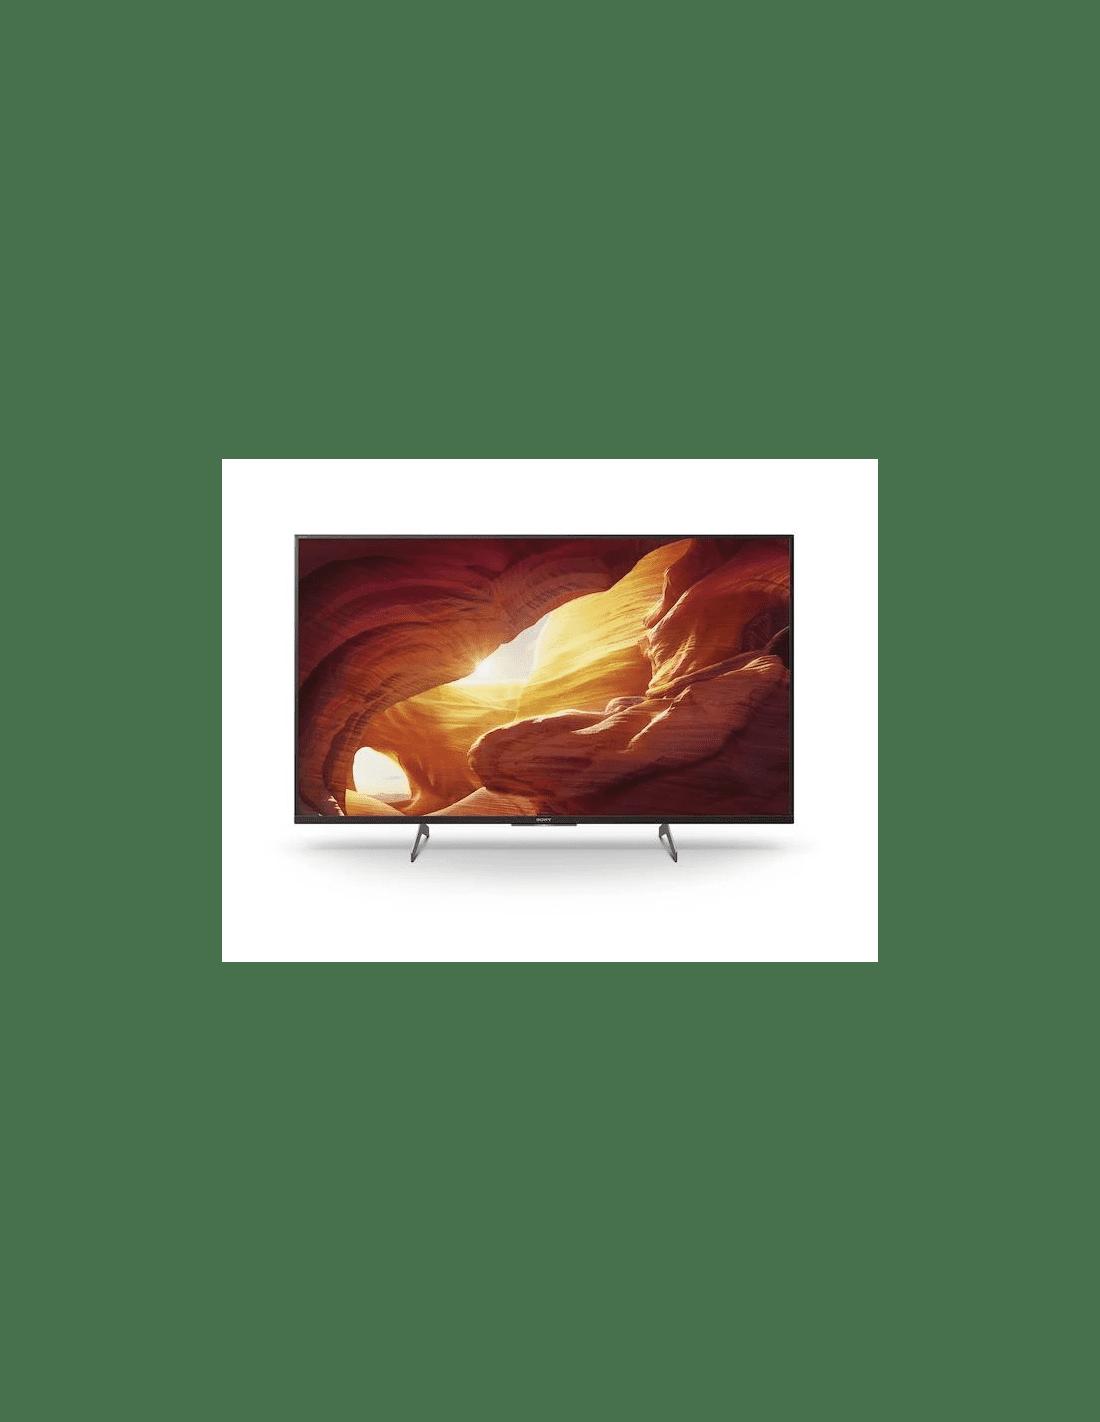 sony-kd43xh8599-led-tv